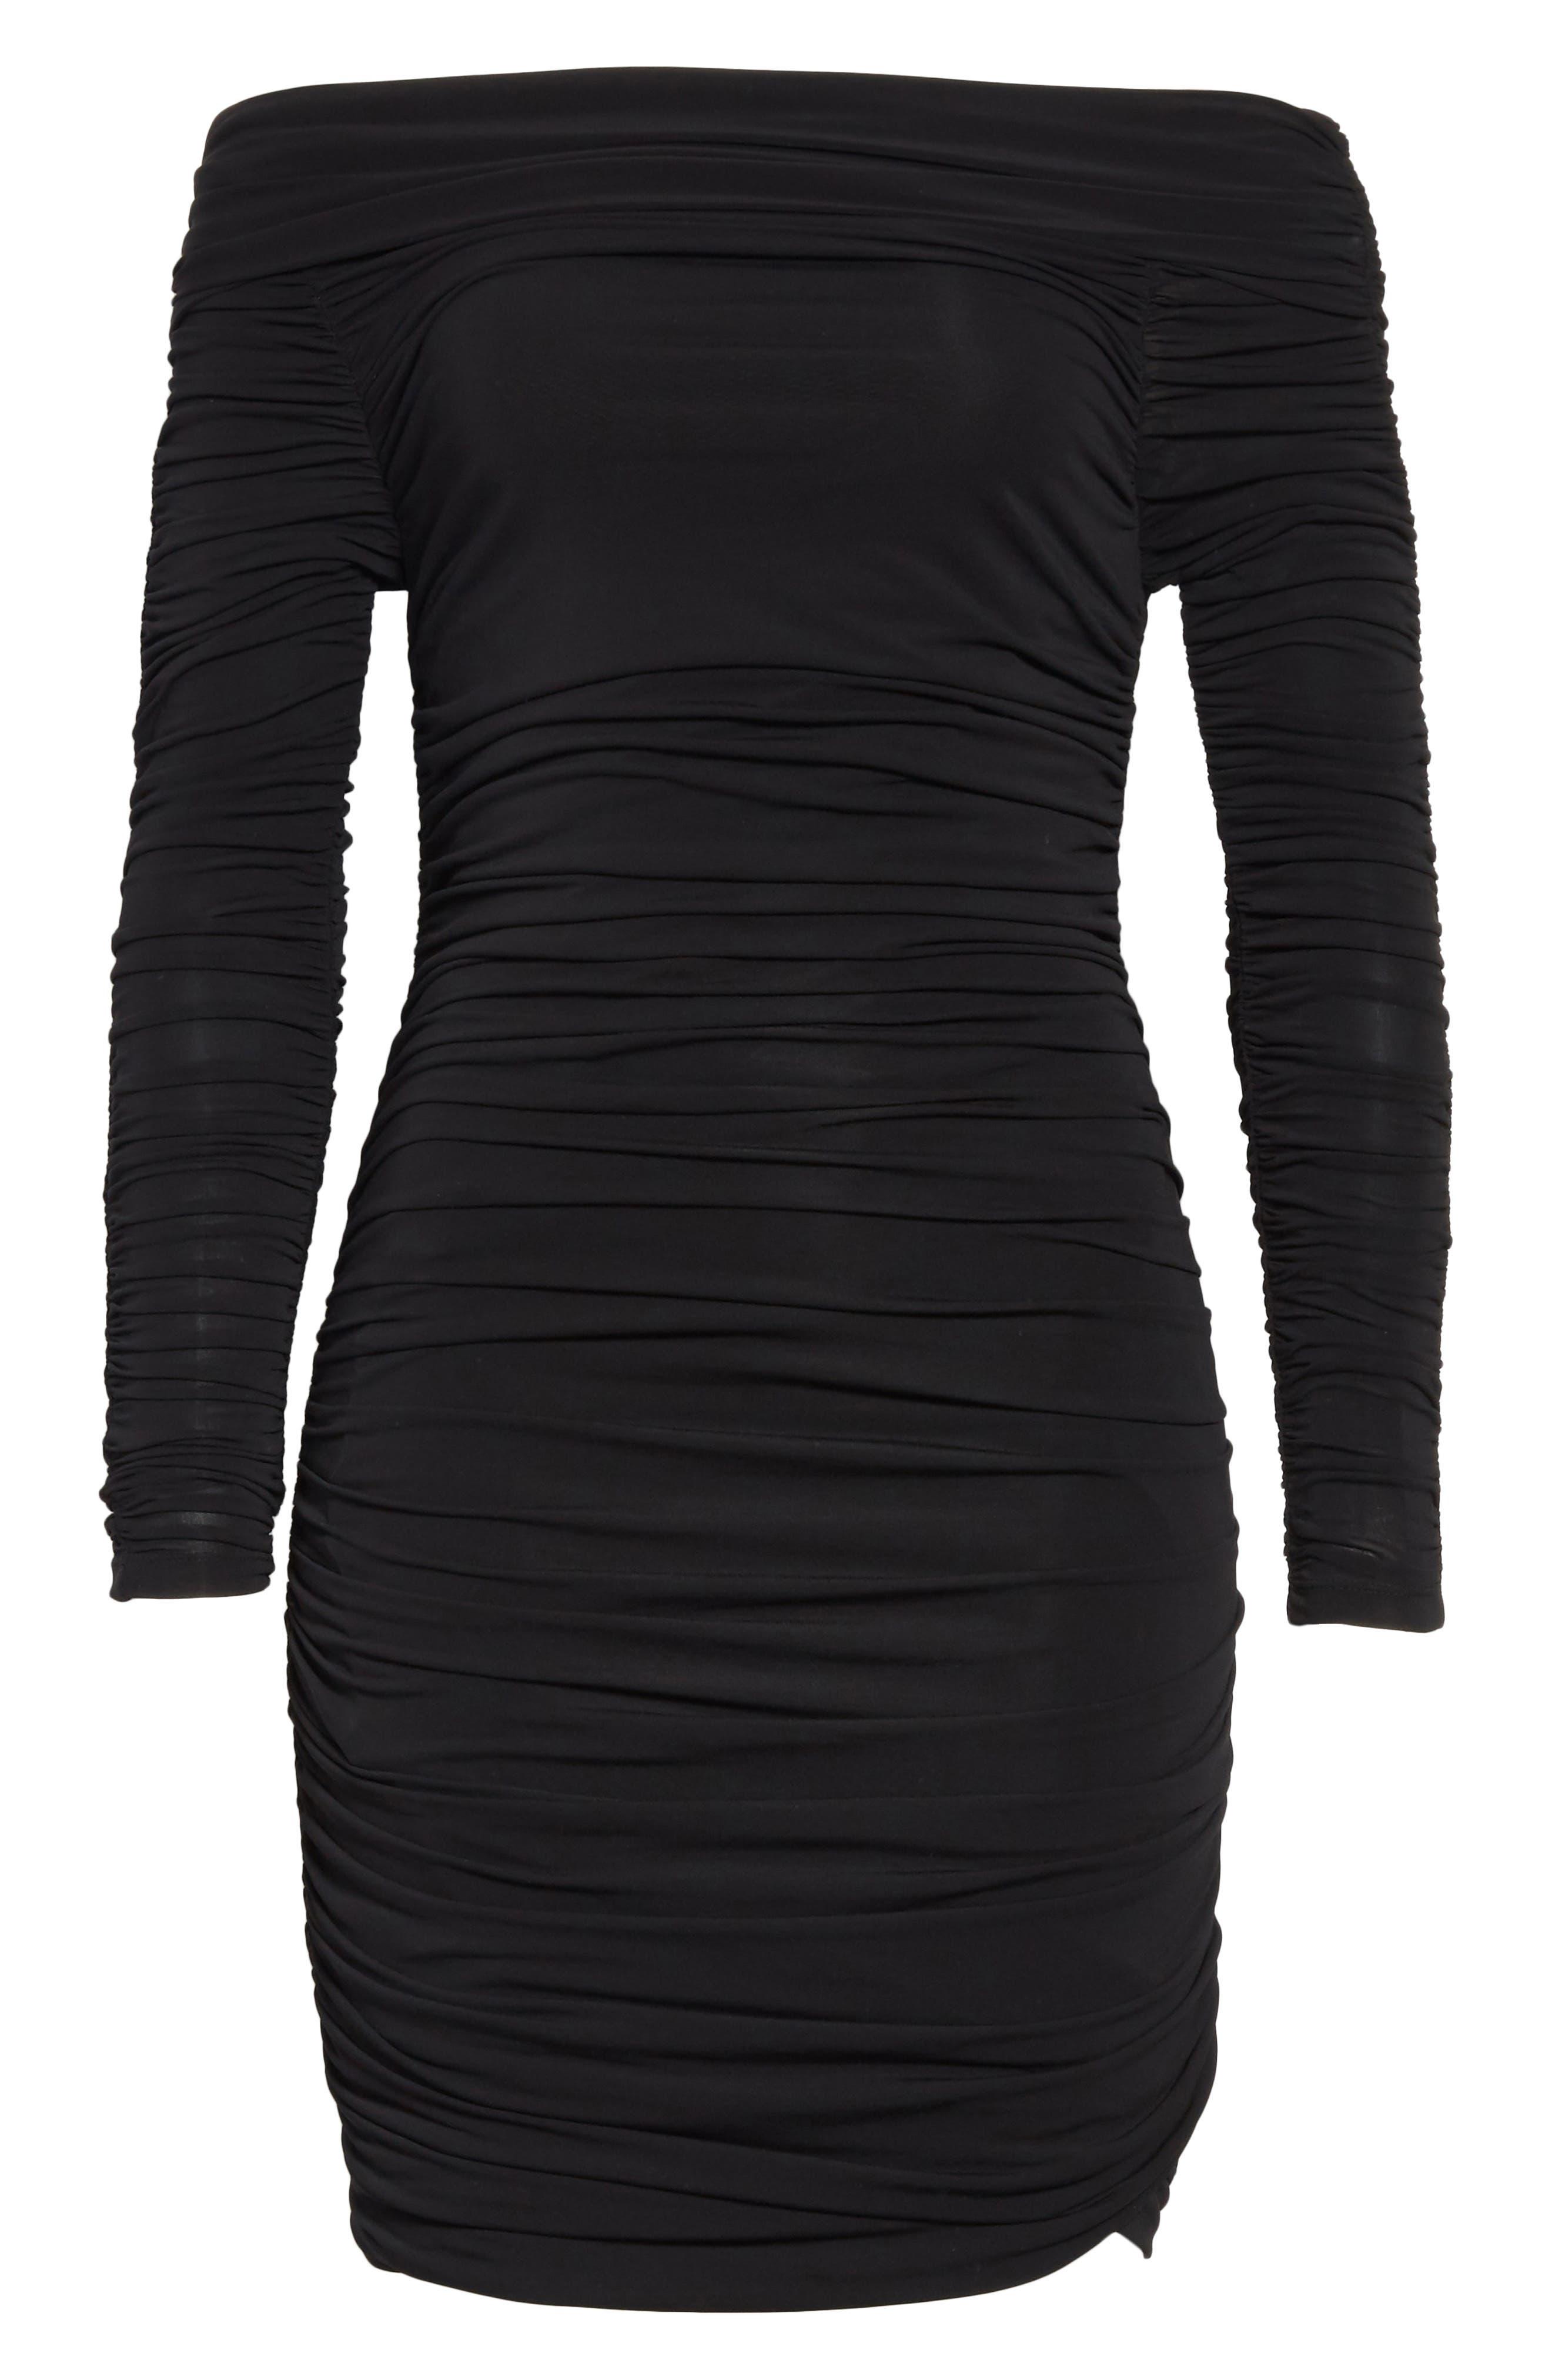 Blaise Off the Shoulder Ruched Dress,                             Alternate thumbnail 6, color,                             Black